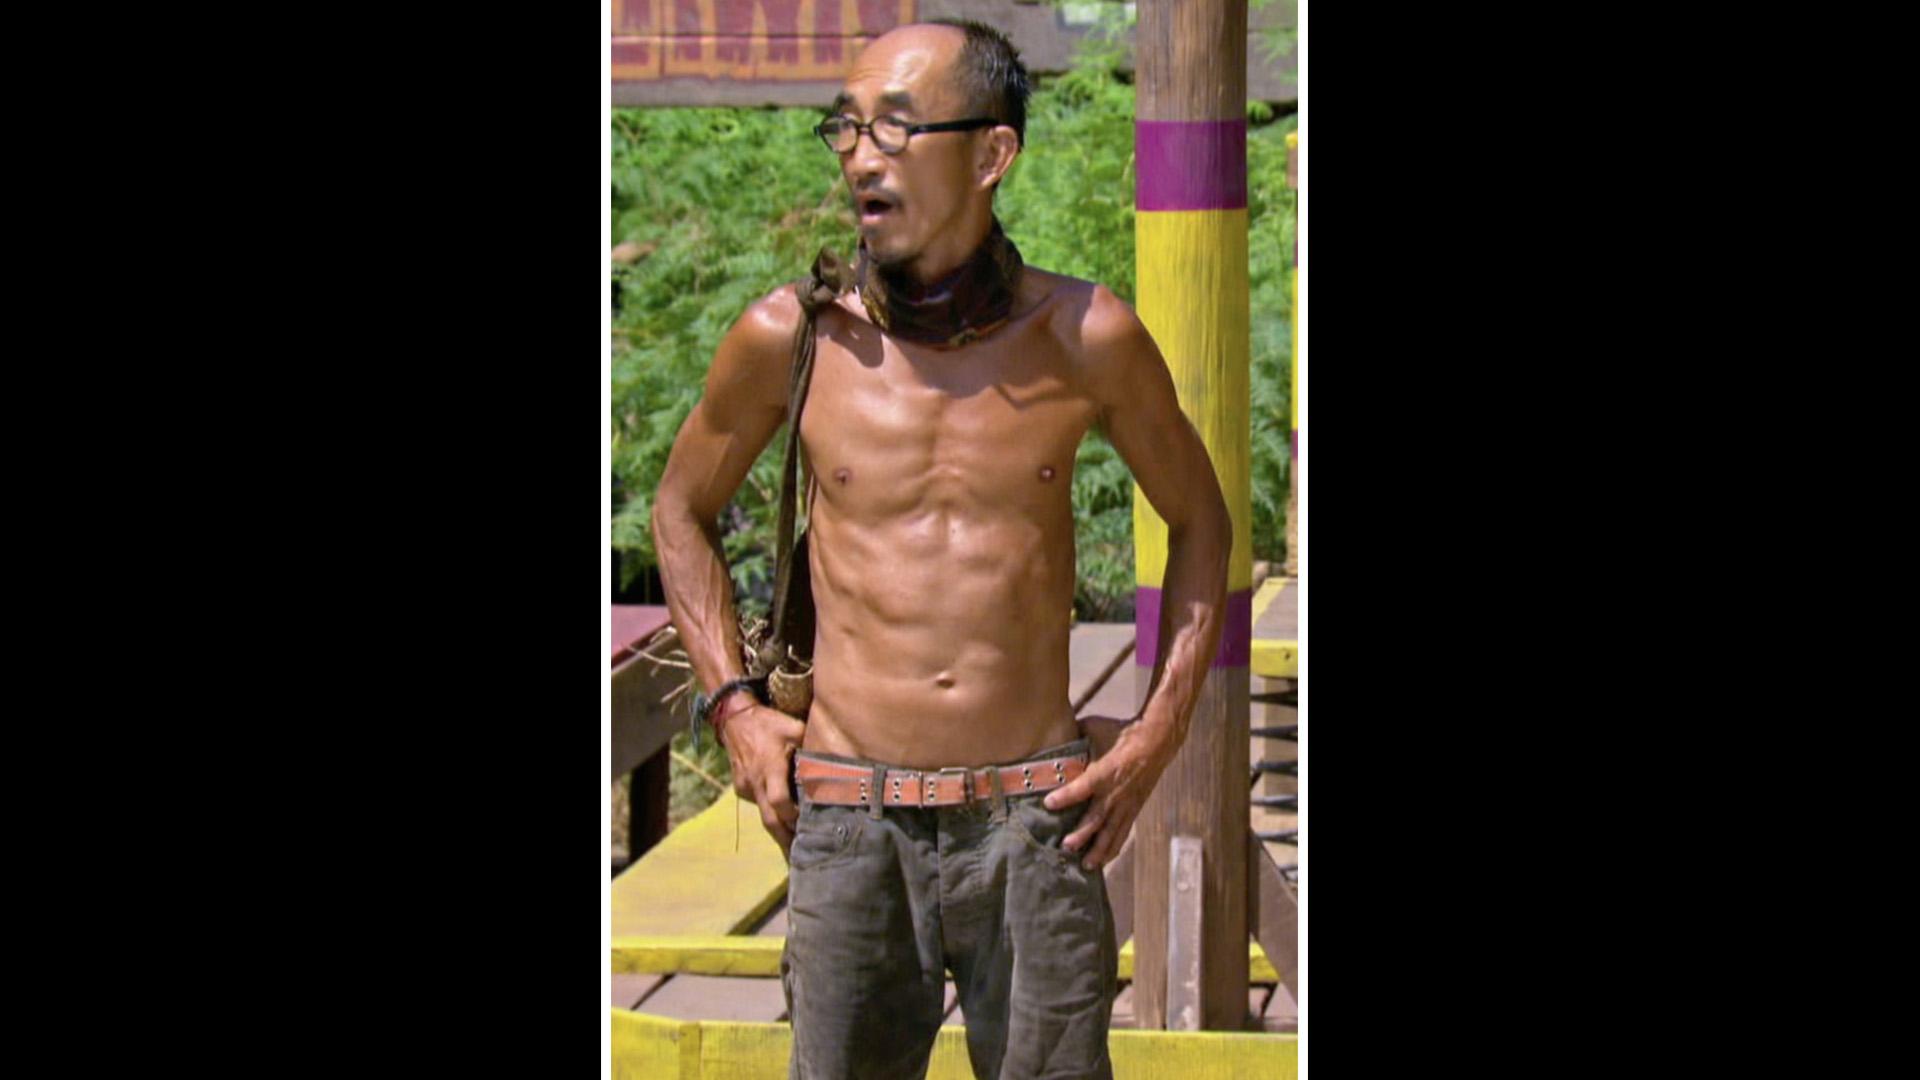 Unwashed castaway: Tai Trang